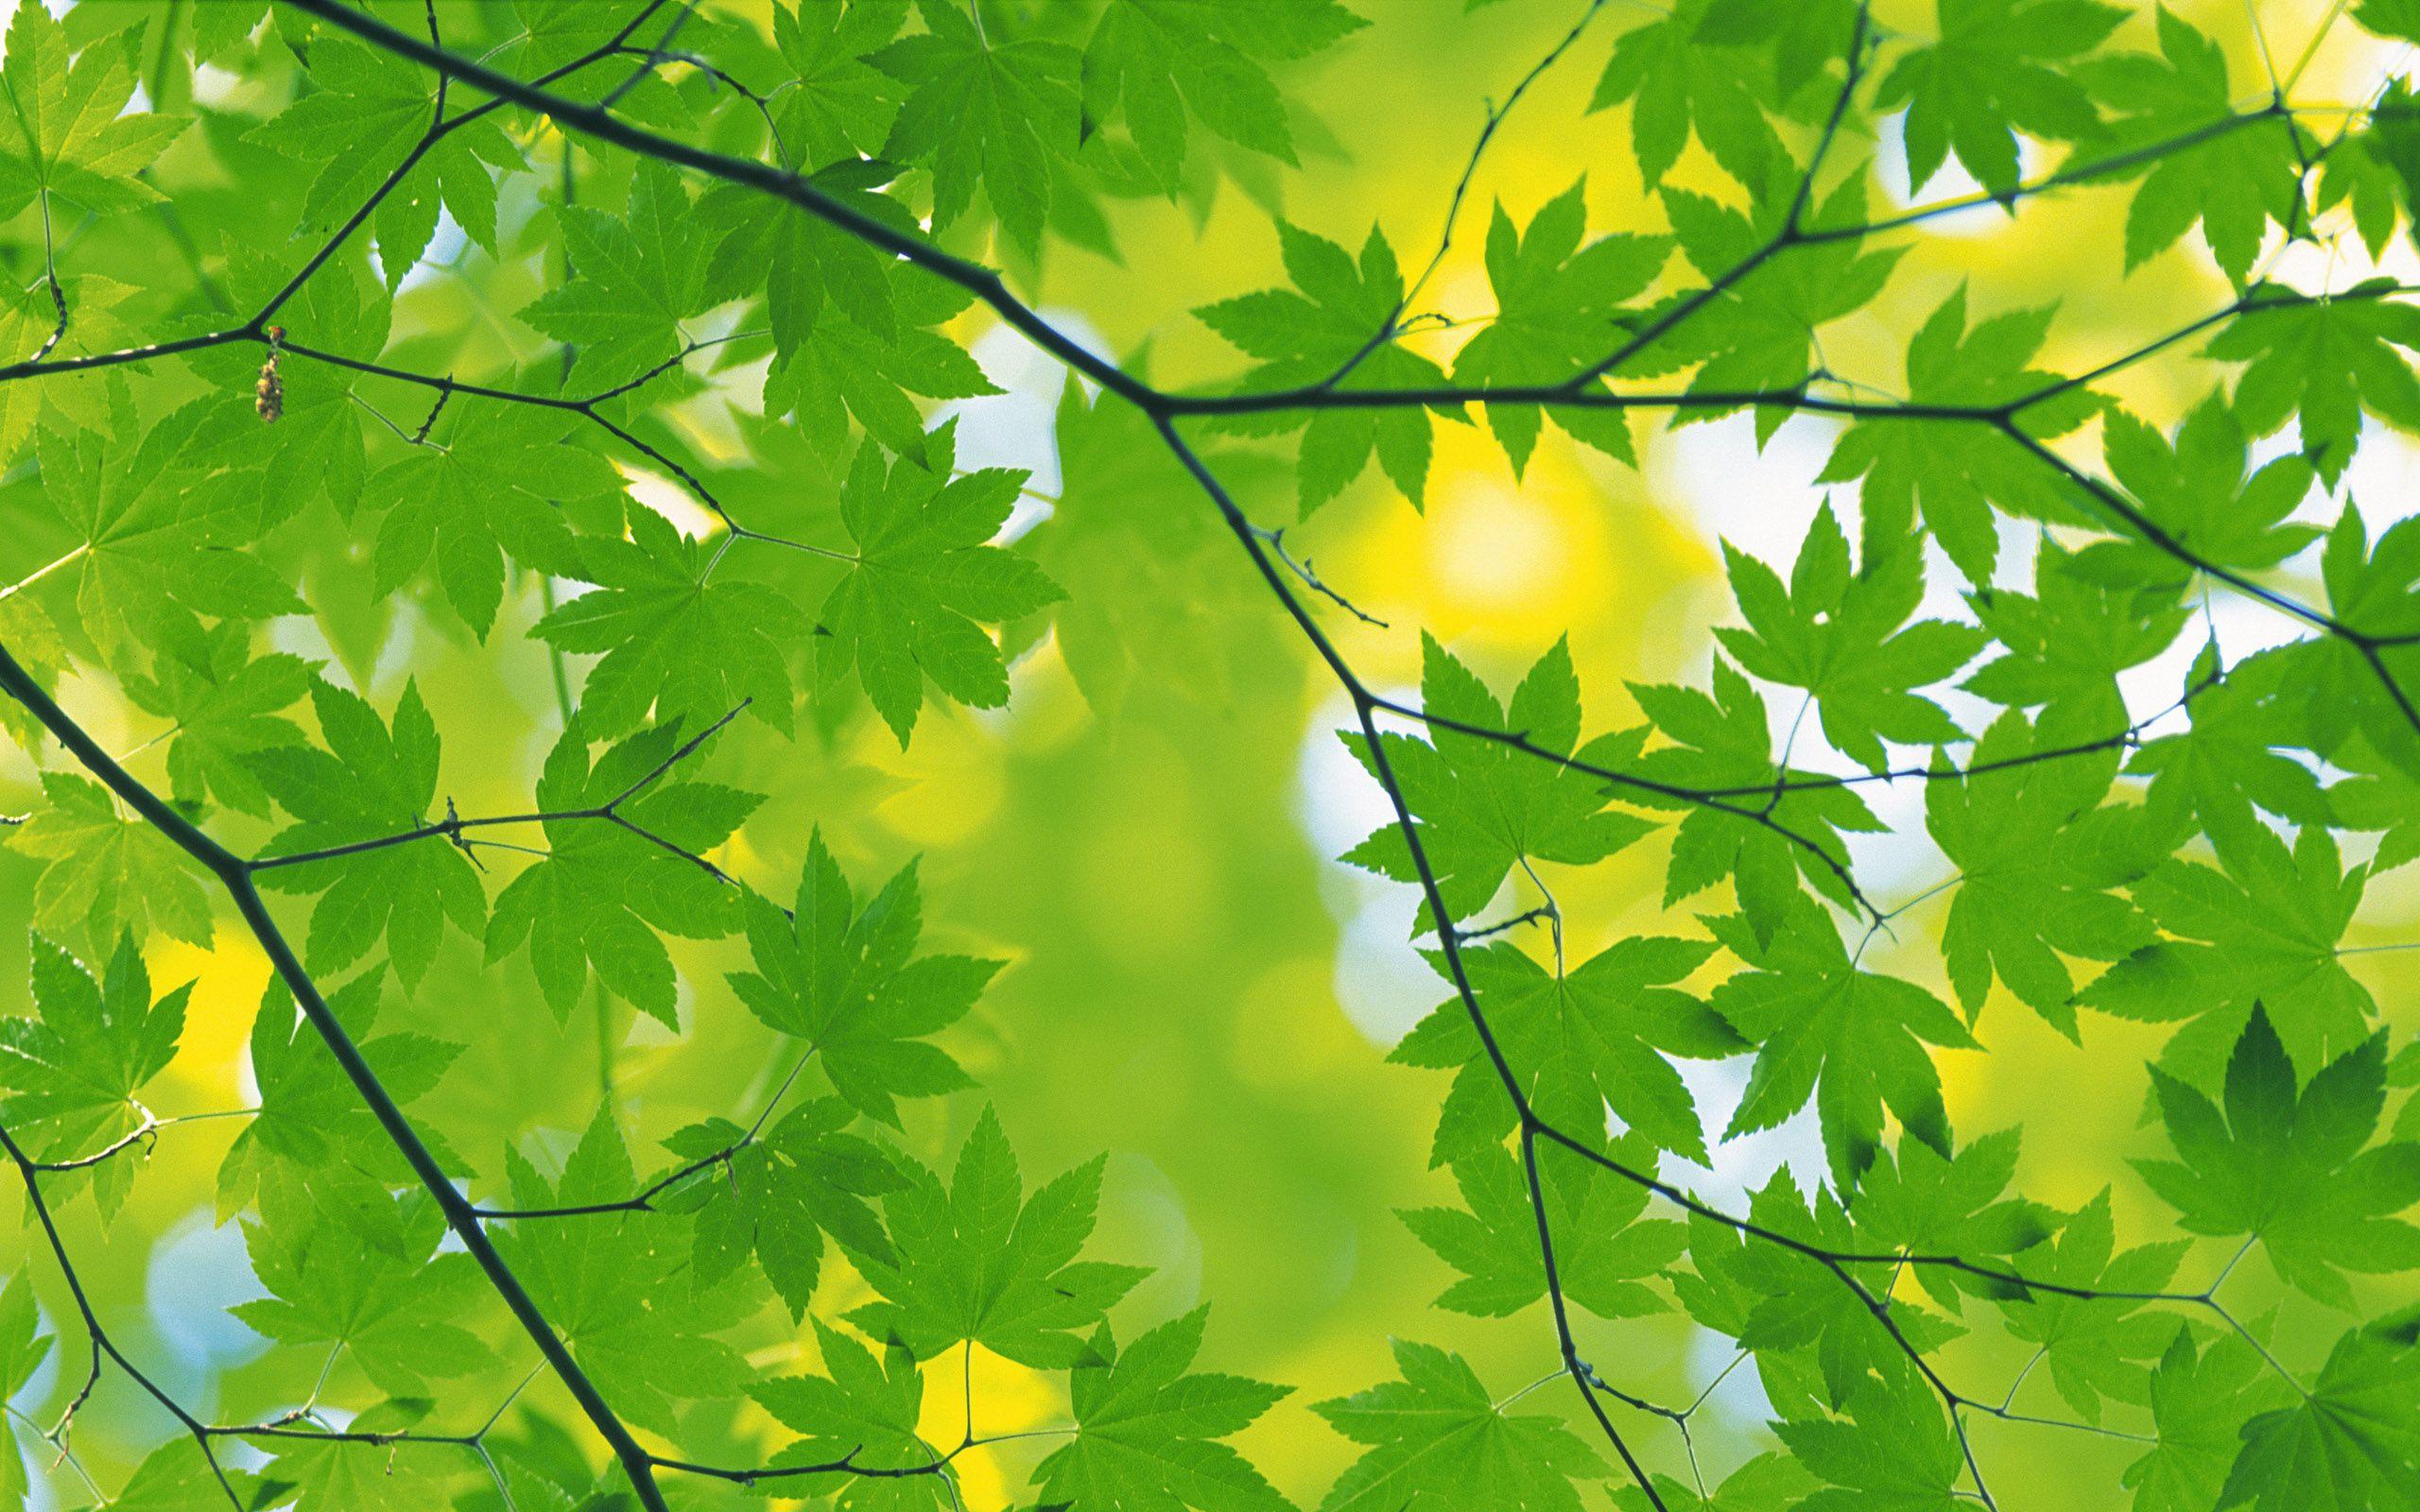 Green Leaf Wallpaper Hd